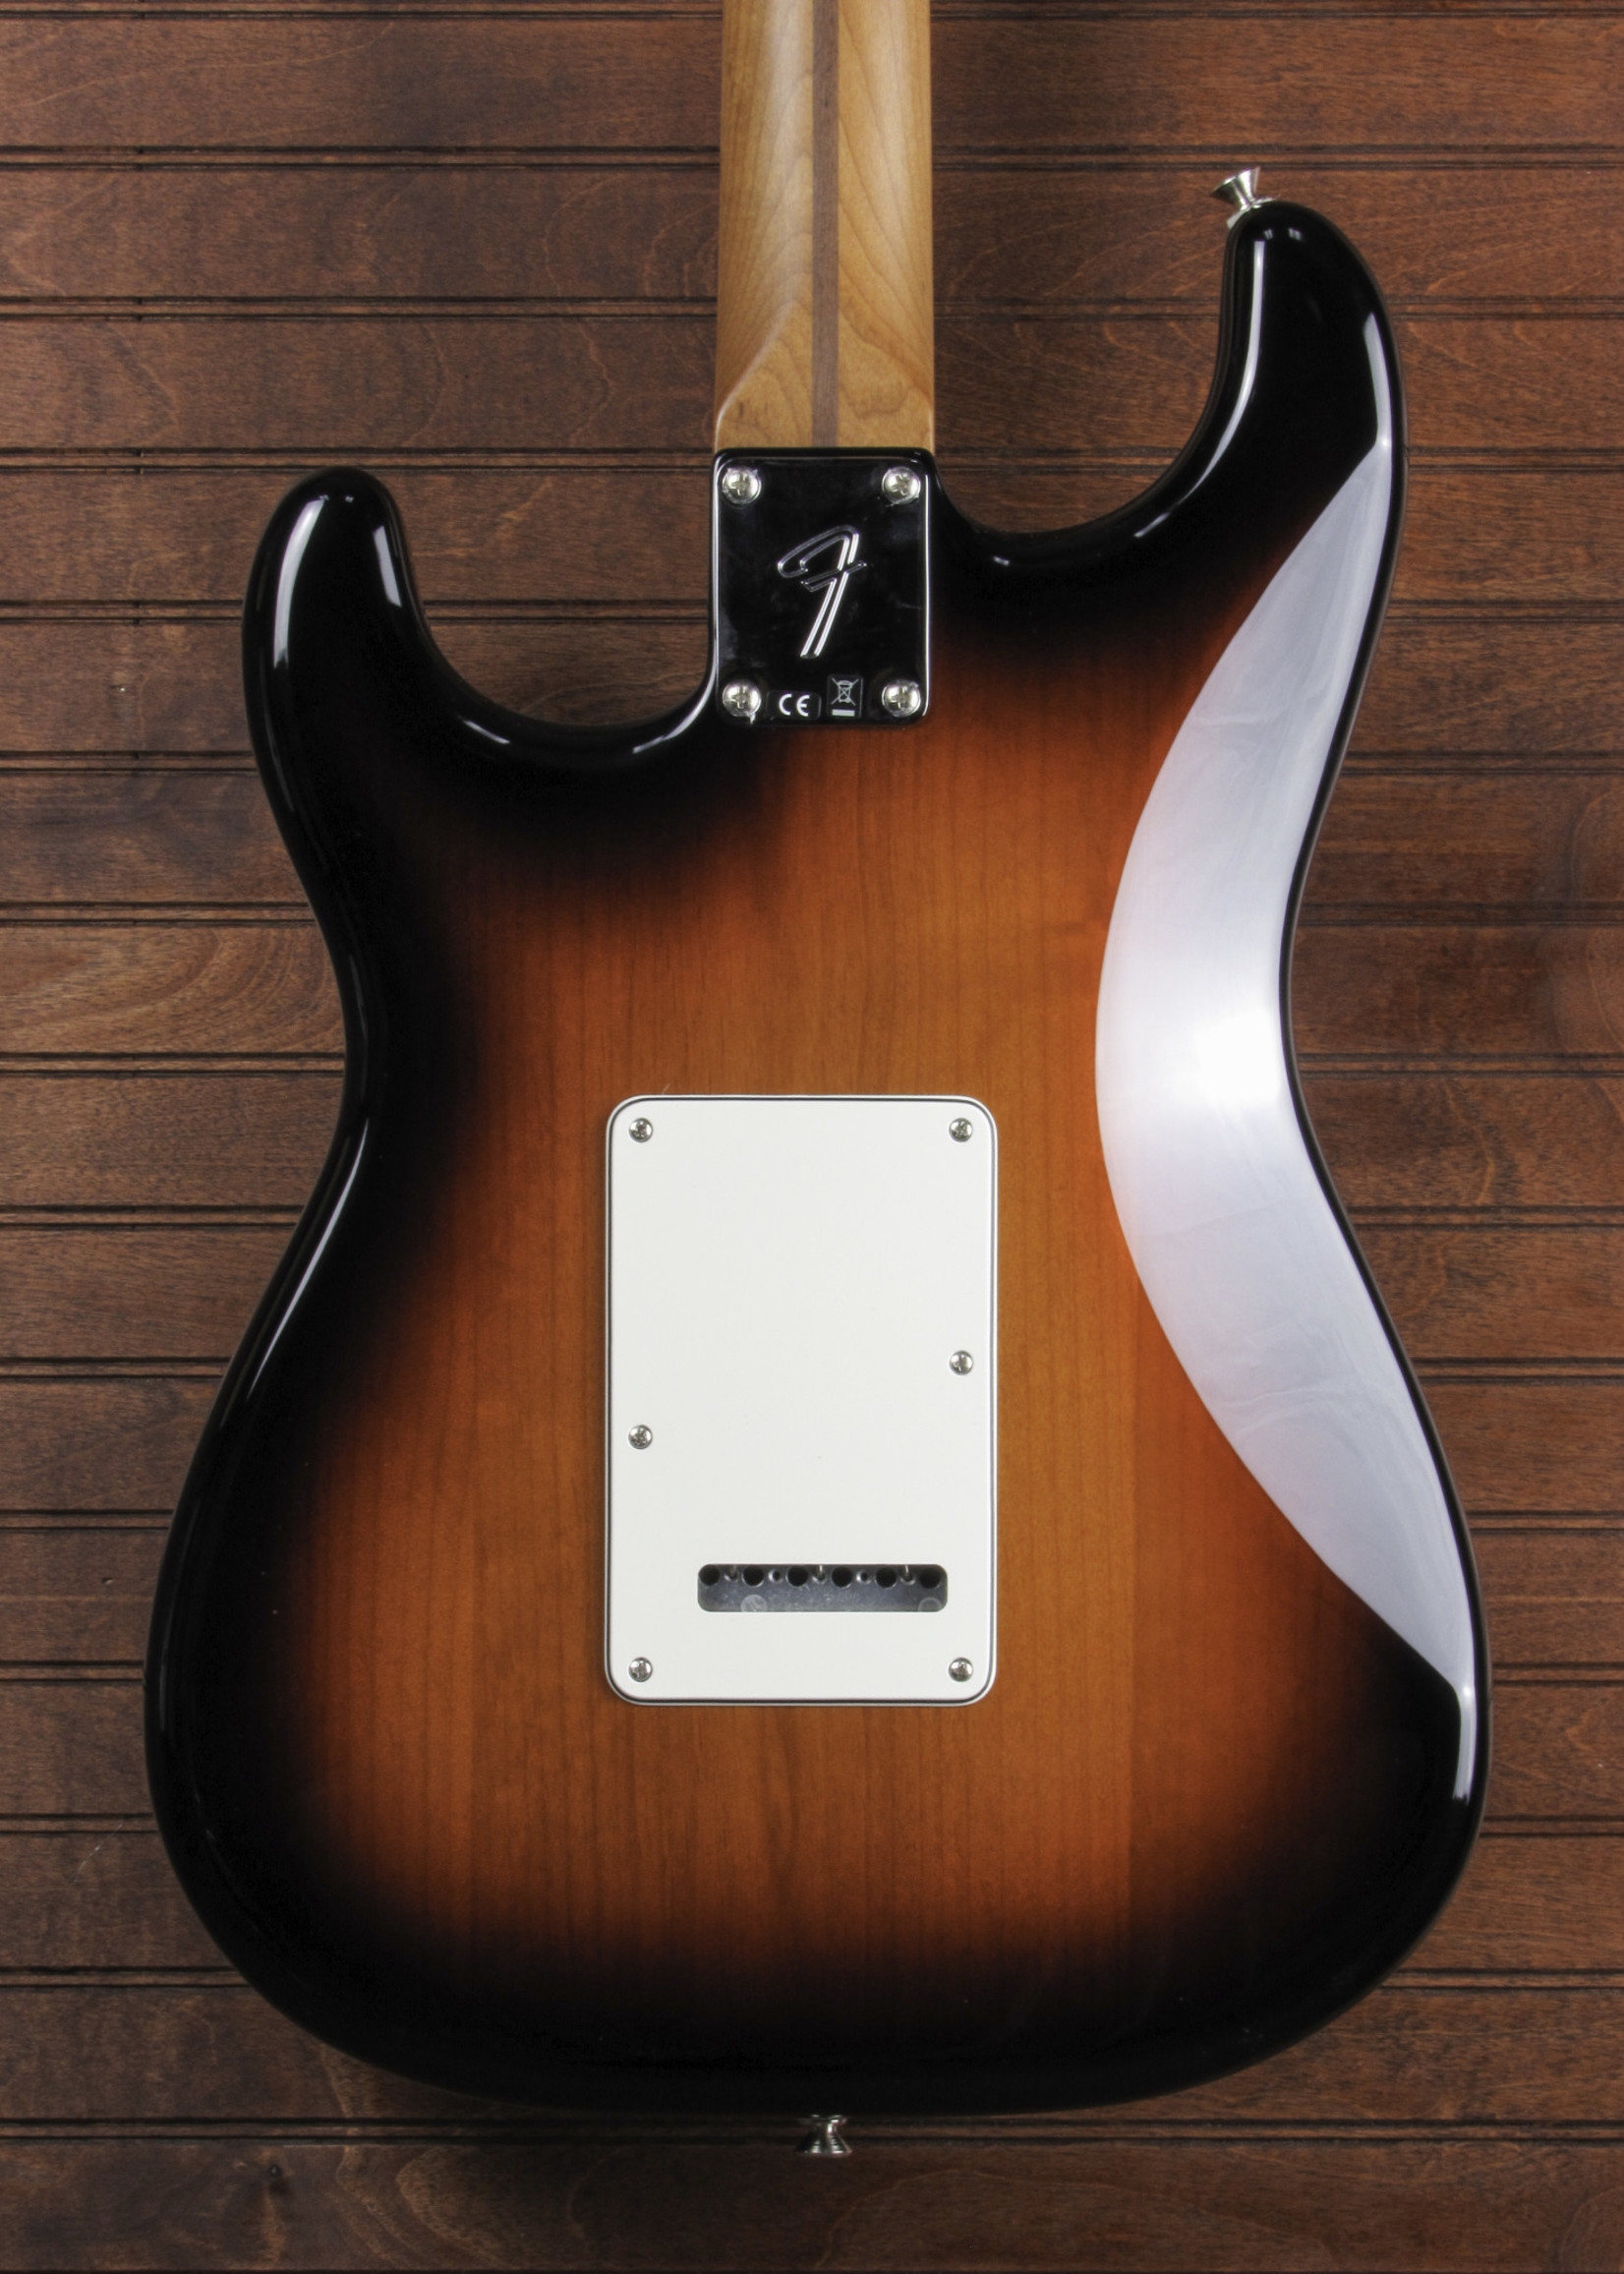 Fender Fender Limited Edition Stratocaster Roasted Maple Sunburst